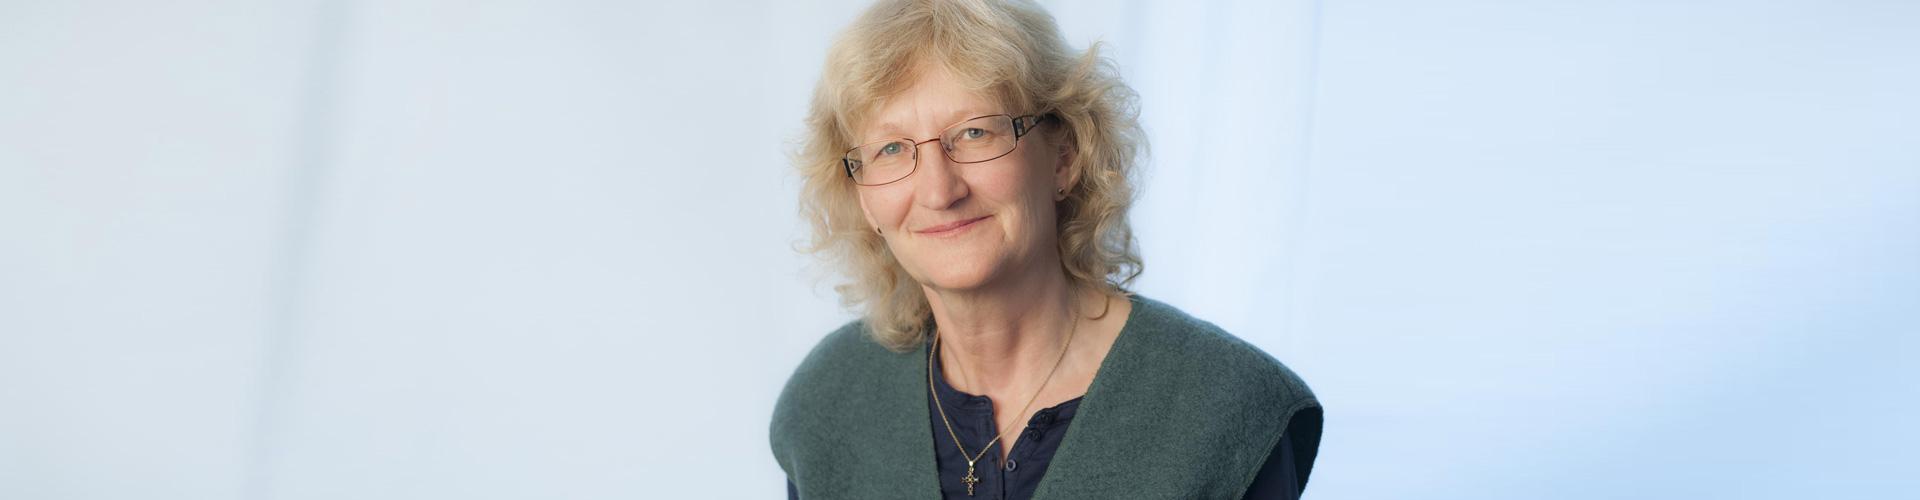 Dr. Höfel-Wellner Psychotherapeutin in Feuerbach